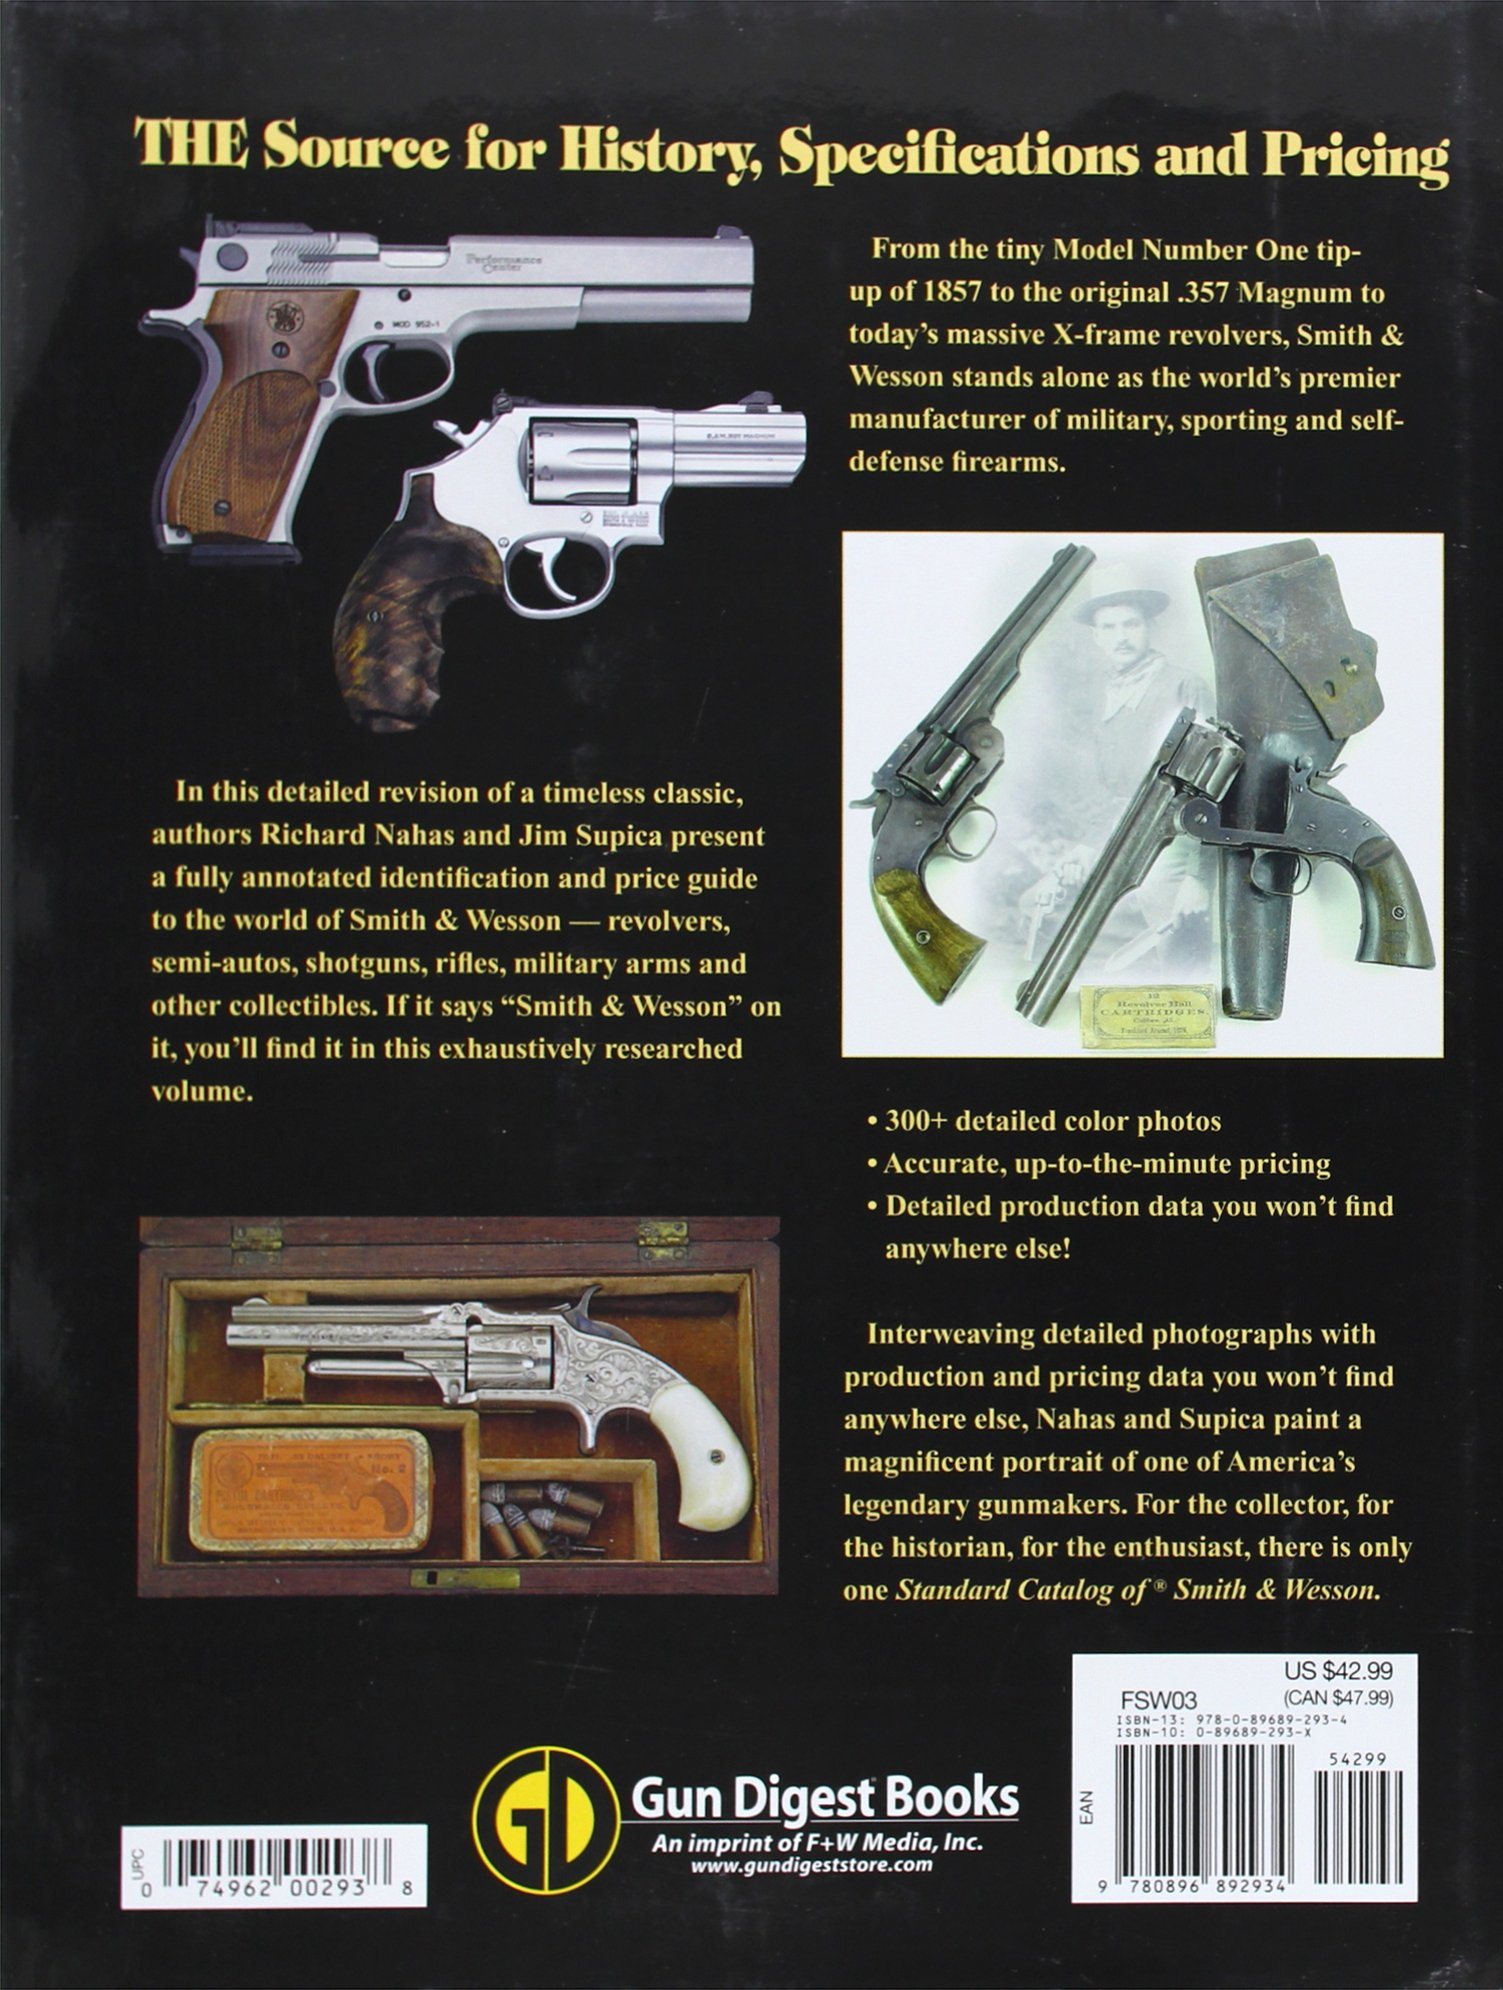 Standard Catalog Of Smith Wesson 0074962002938 Jim Amp Schematics Supica Richard Nahas Books